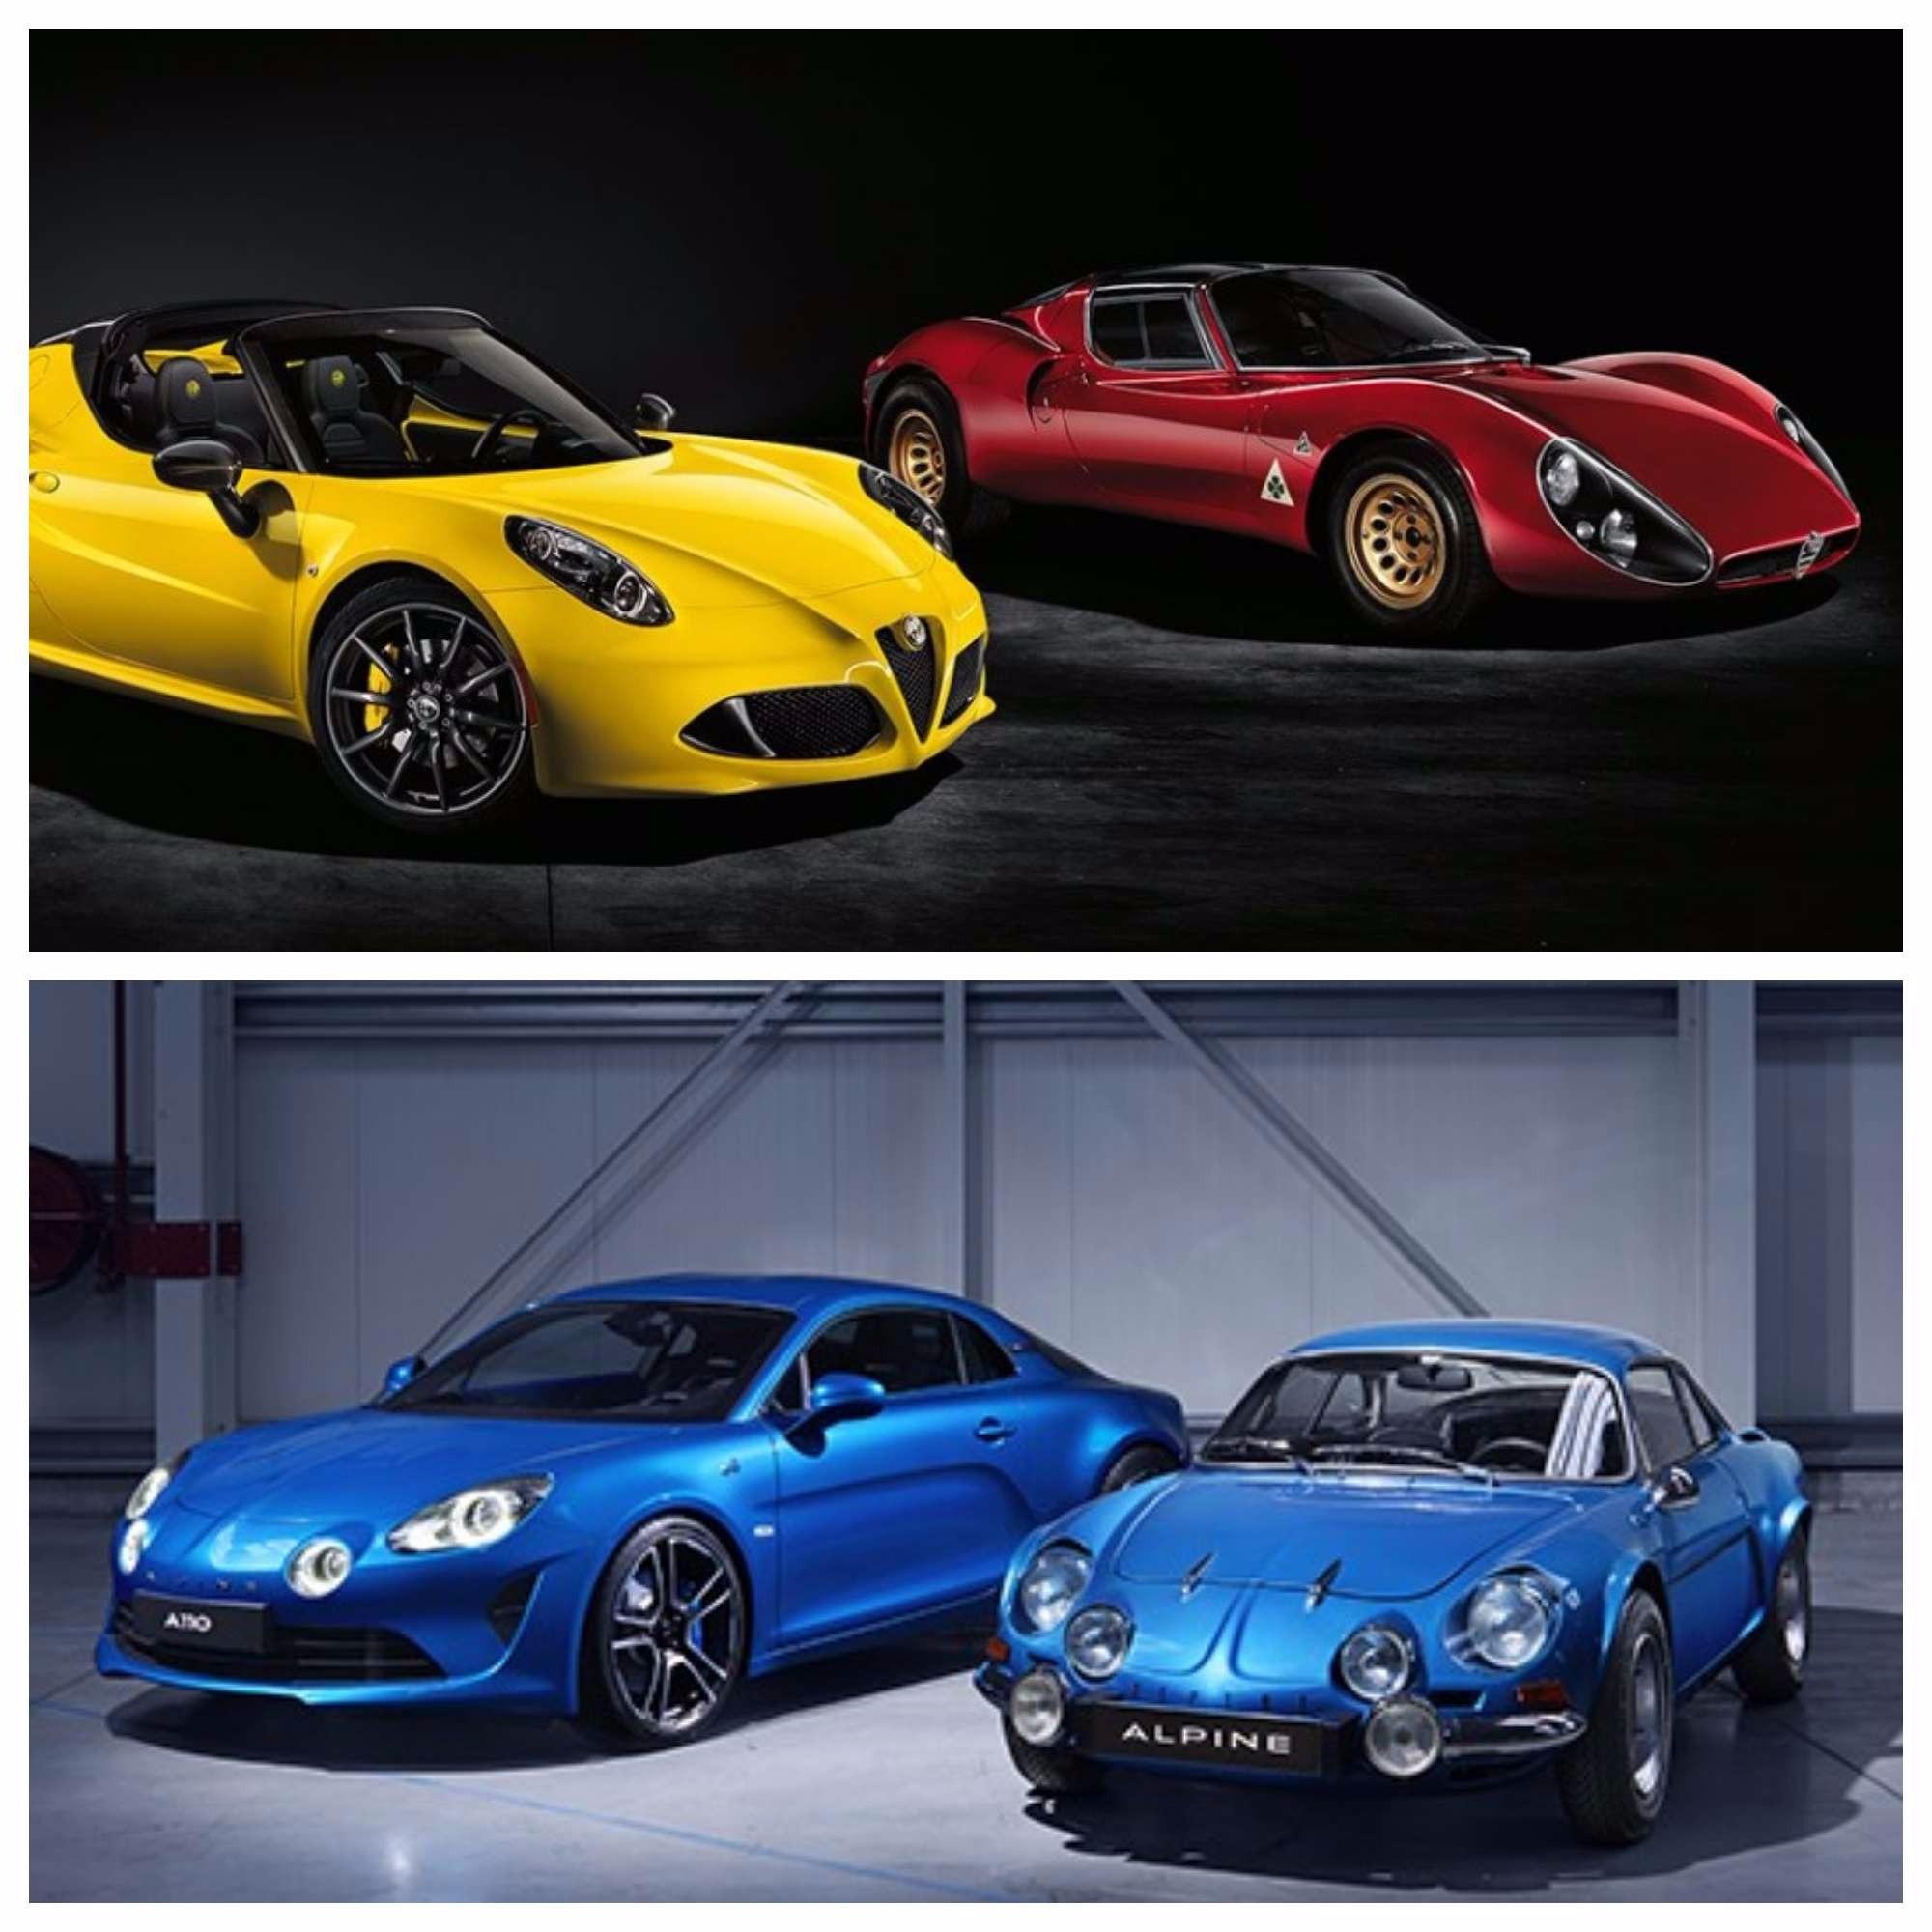 Alfa Romeo 4C VS Alpine A110